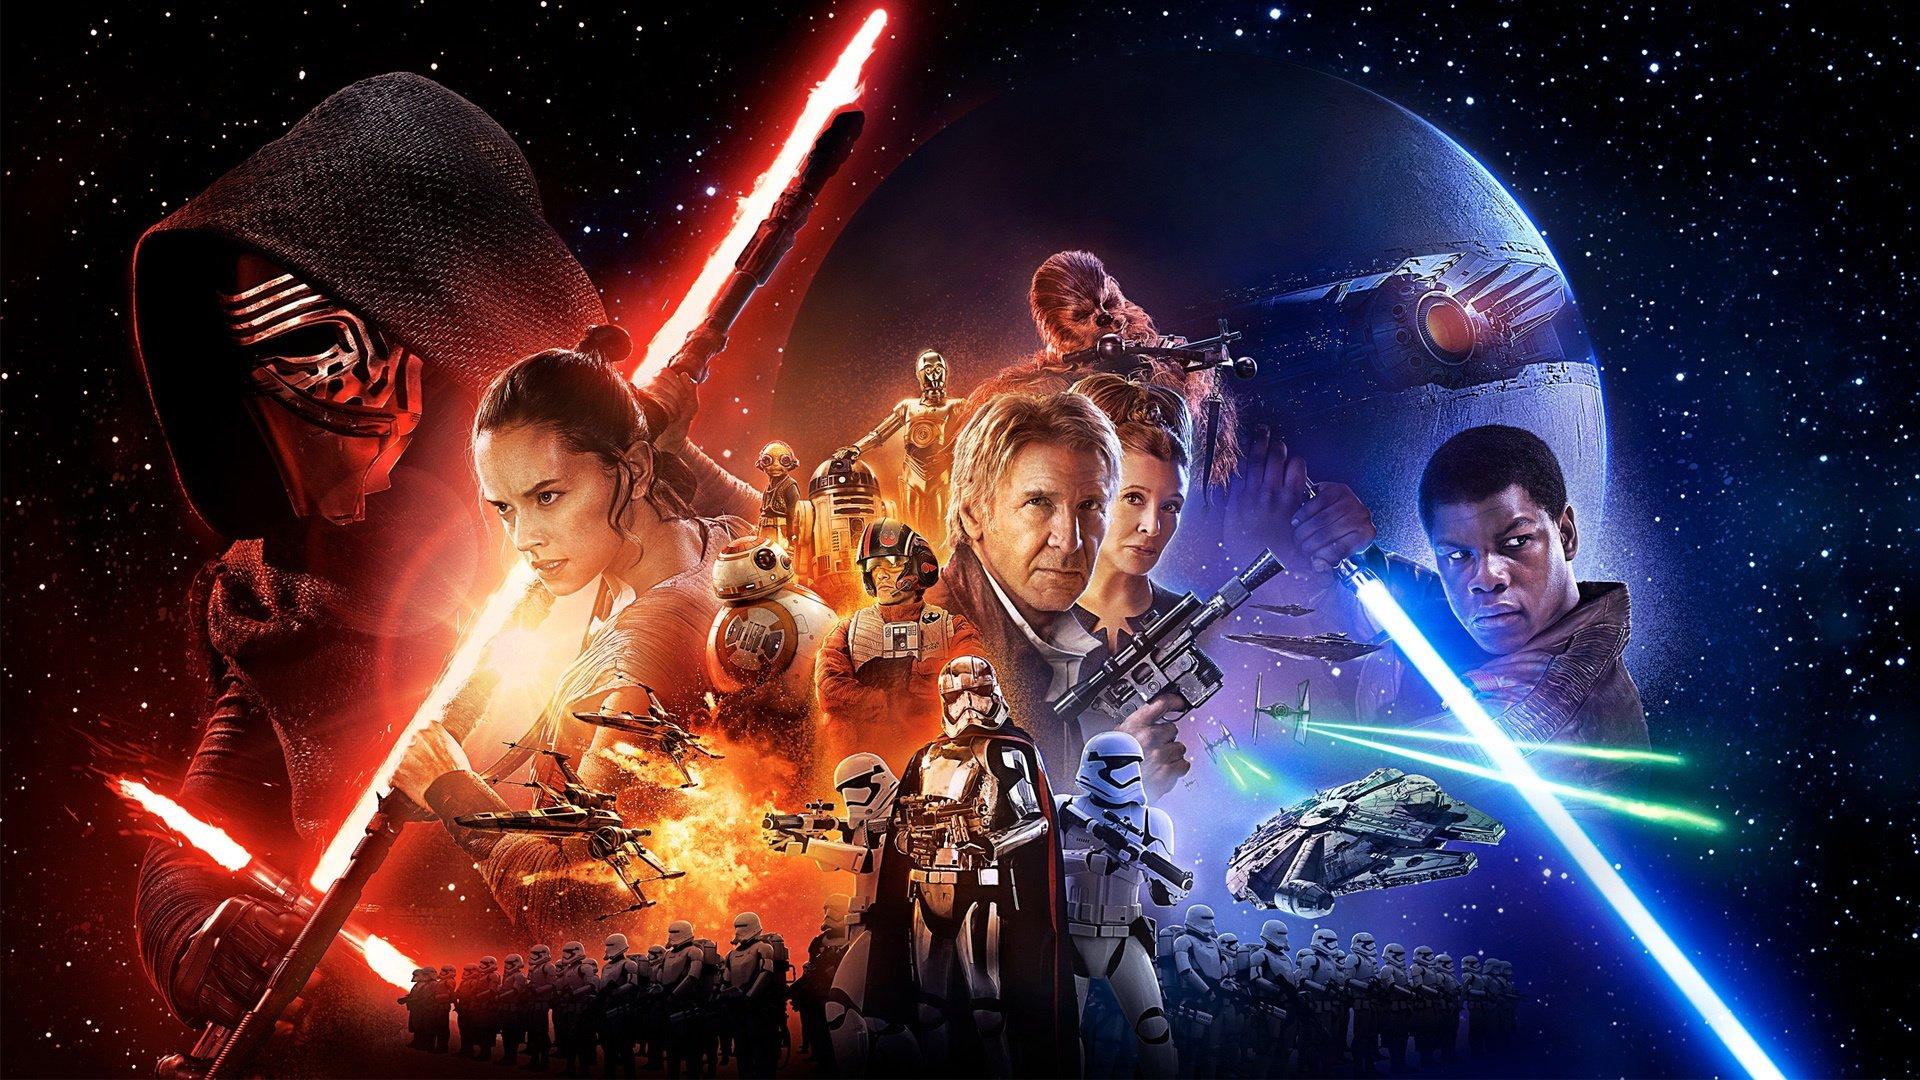 Star Wars Episode Vii The Force Awakens Movie 19912 Hd Wallpaper